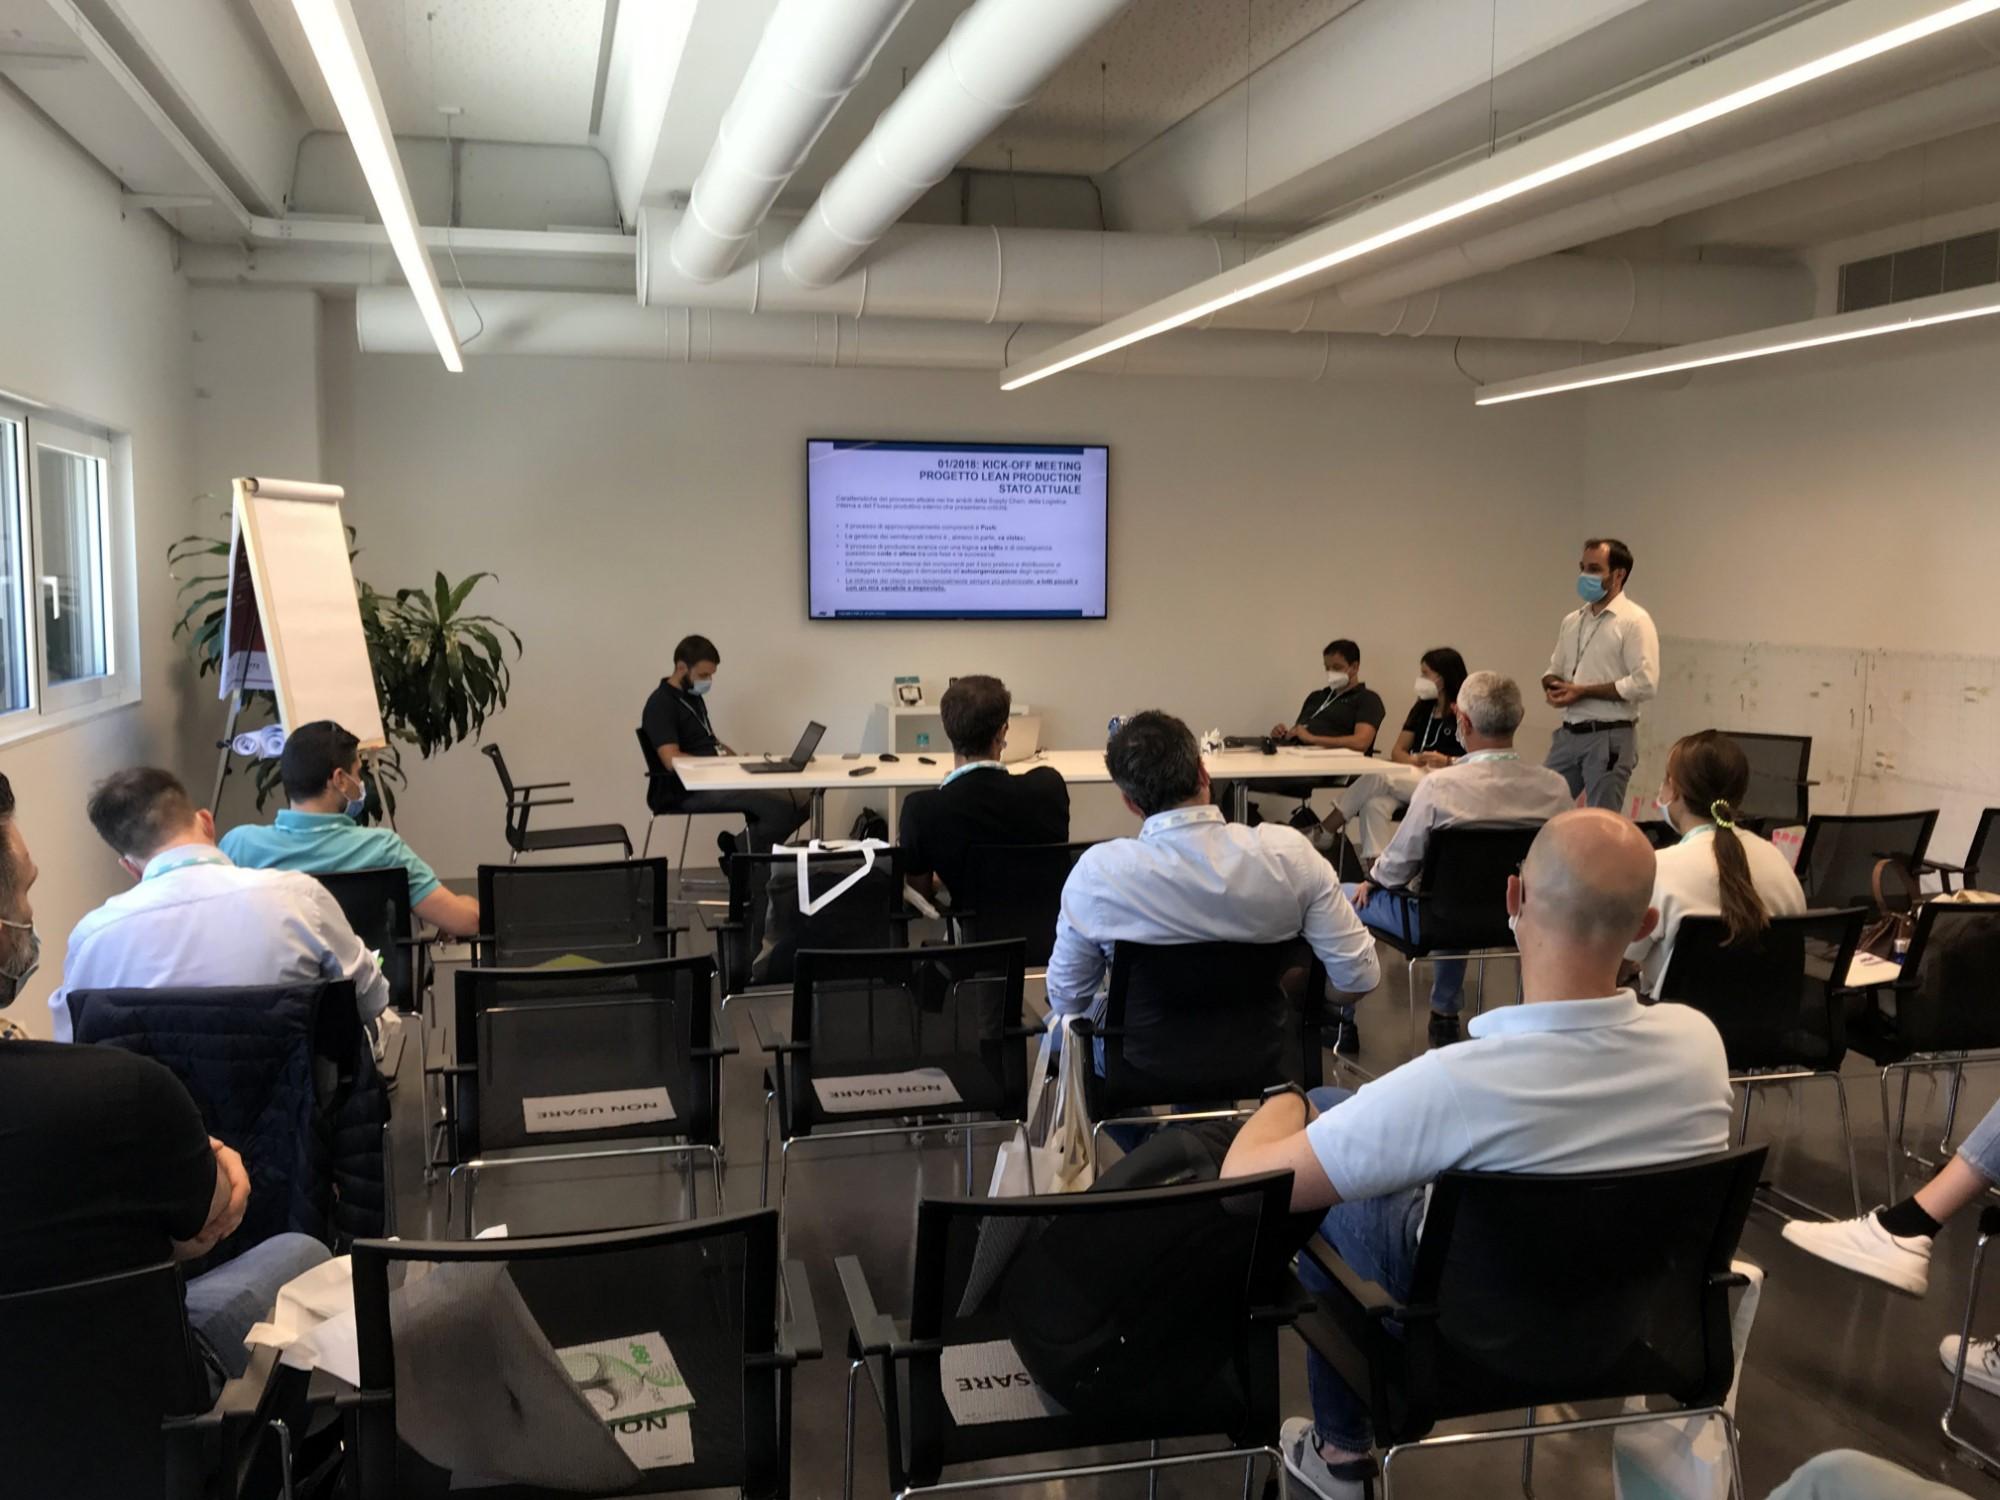 ASA case study at Lean Management Master CUOA 2021